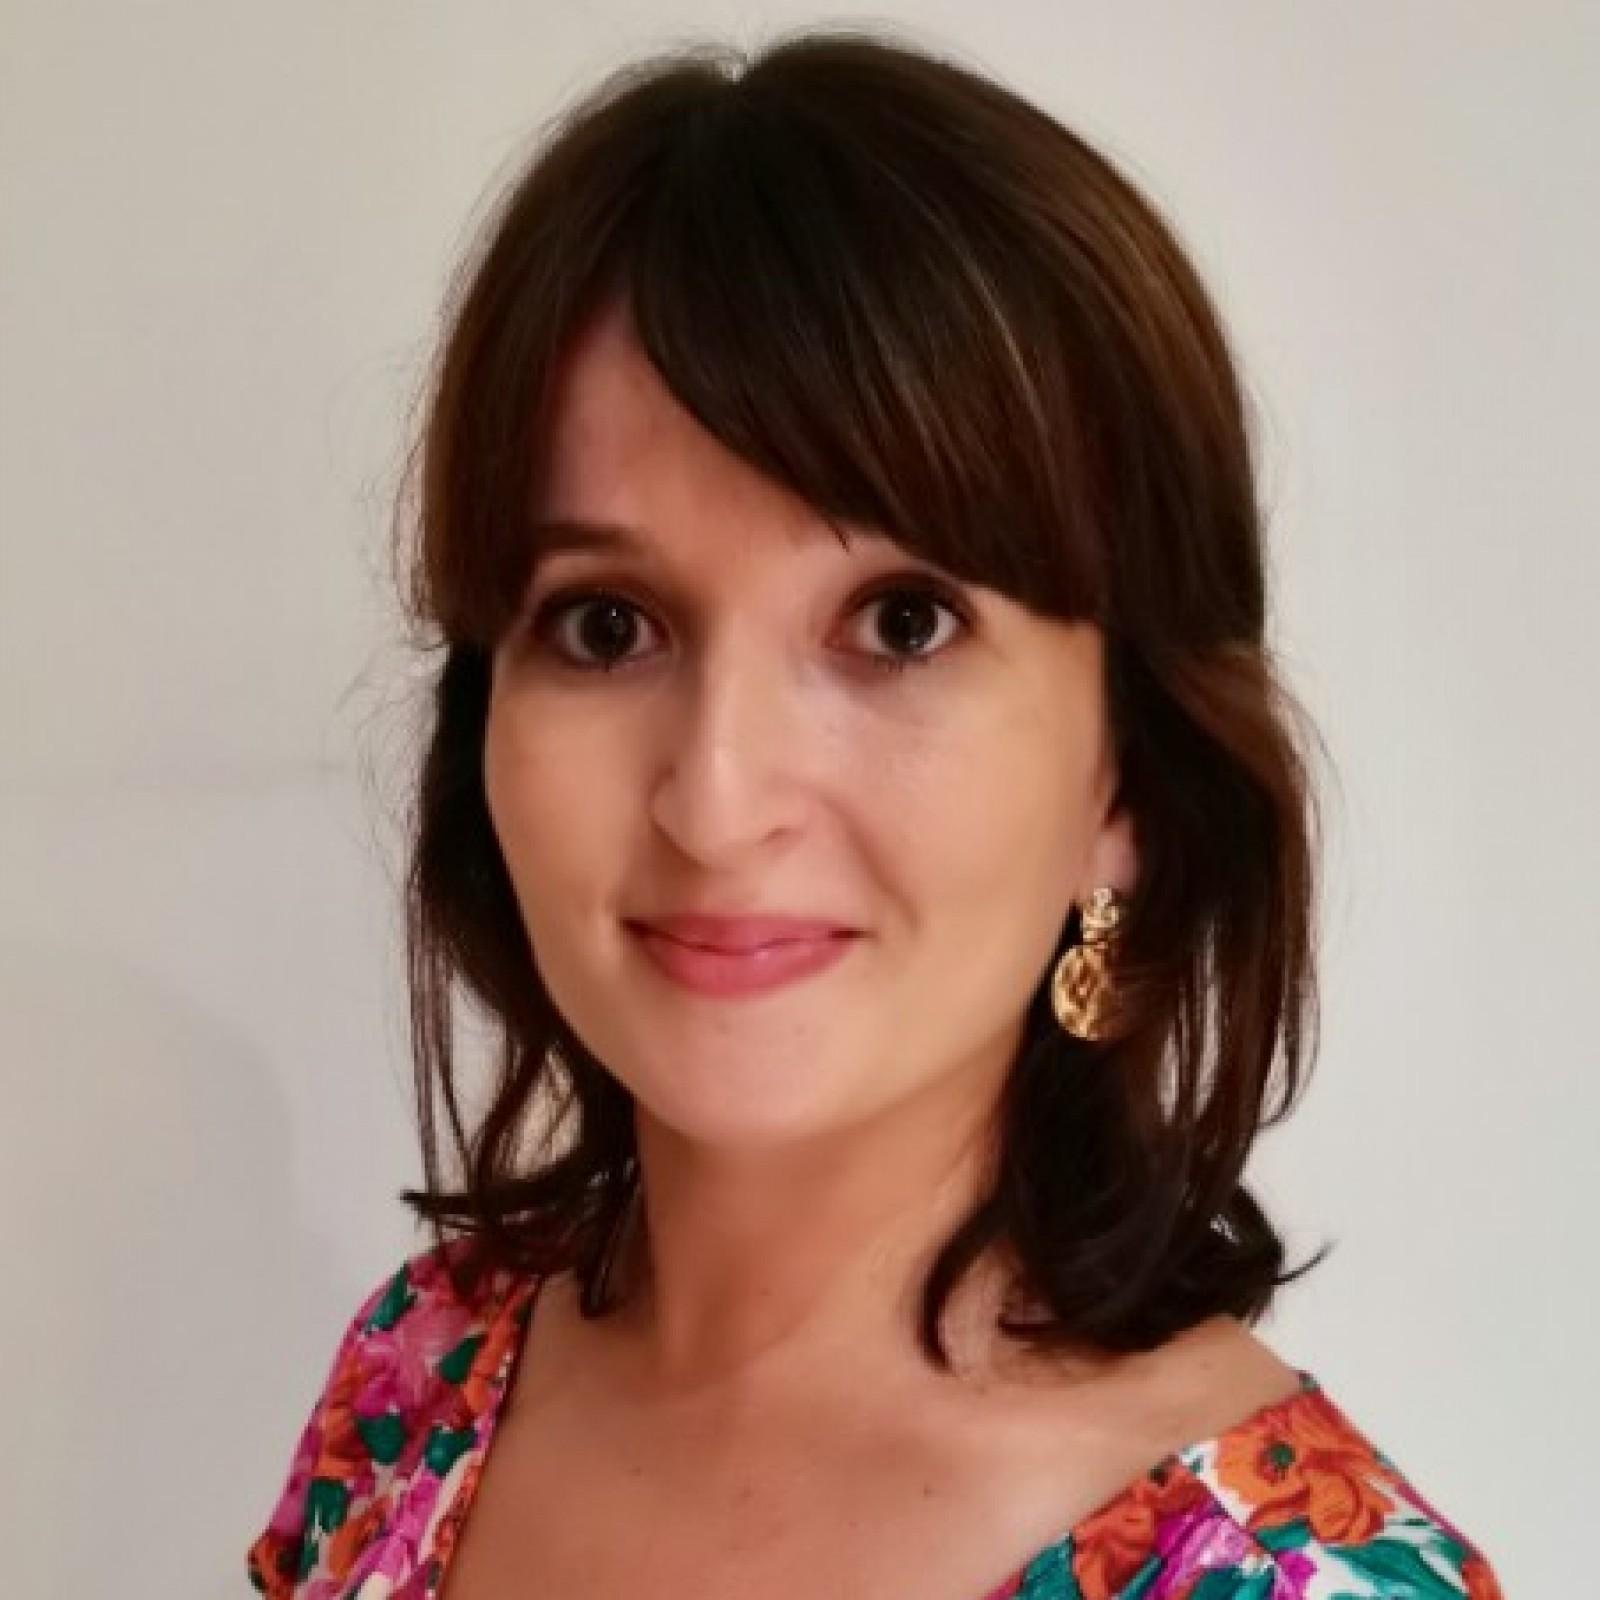 Dr. Olivia Kérourédan, PHD, DDS